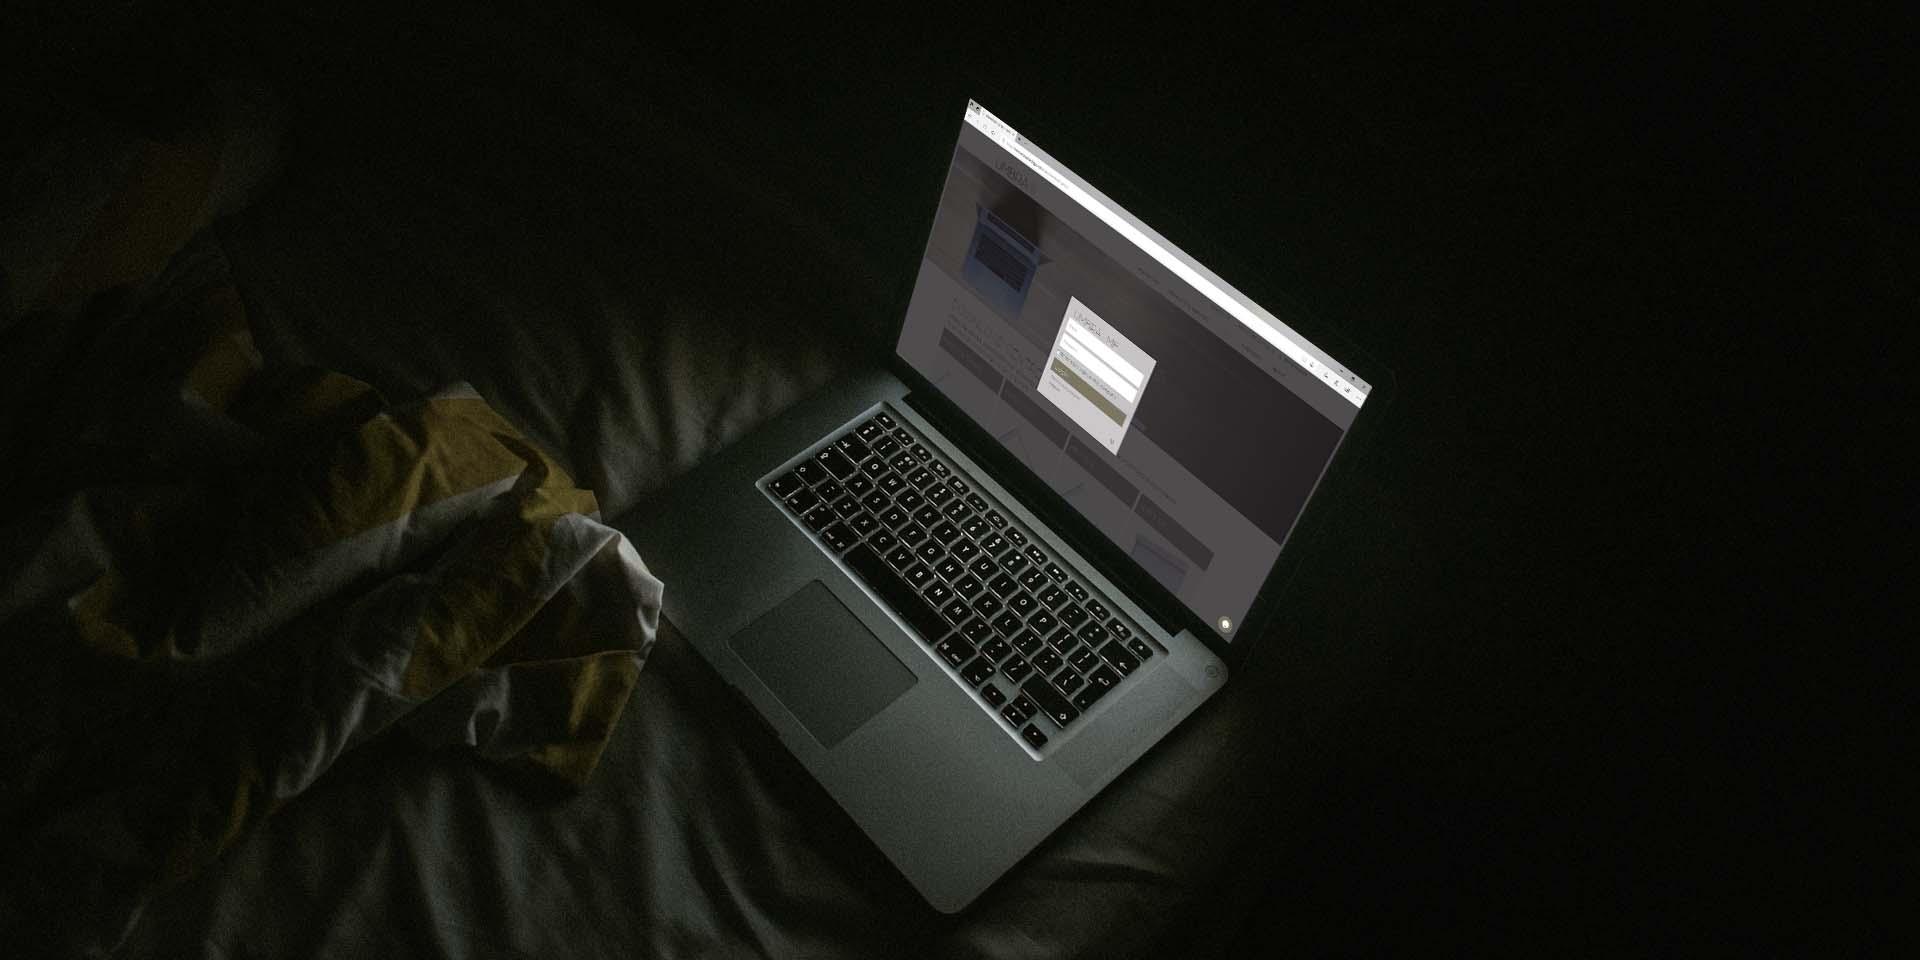 login box on umbra website on laptop screen